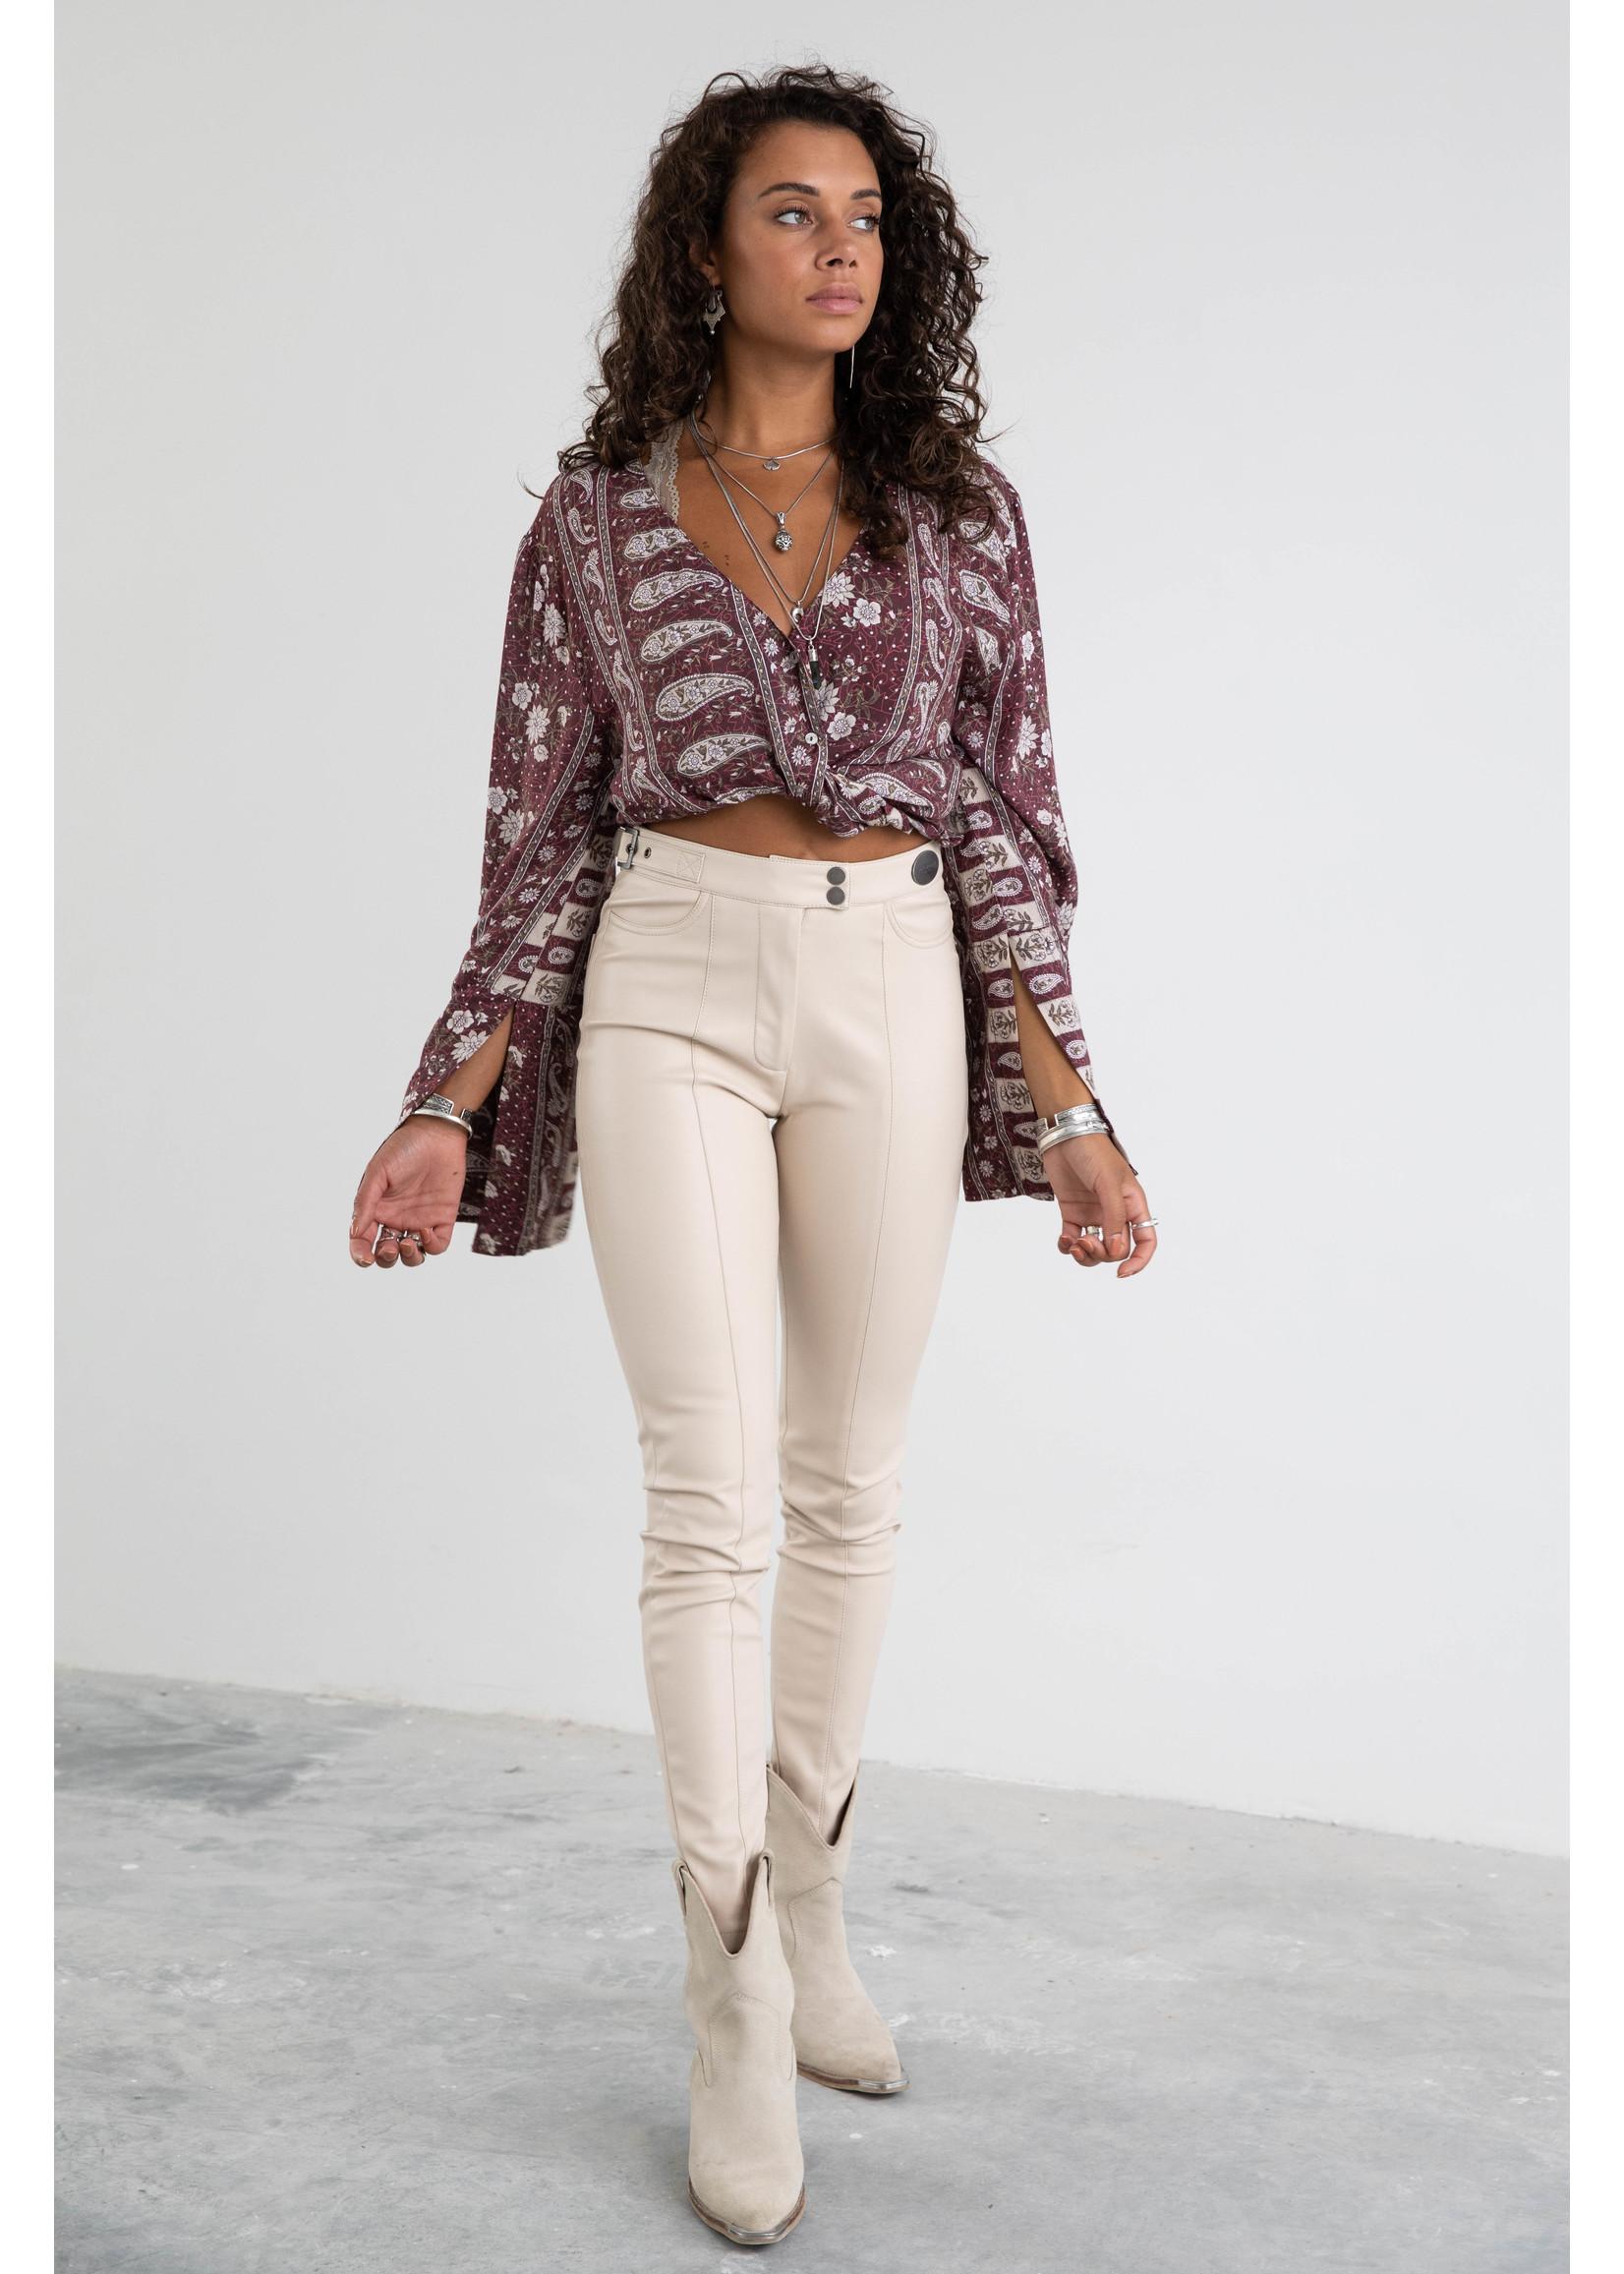 Moost Wanted Myana leather pants LIGHT BEIGE